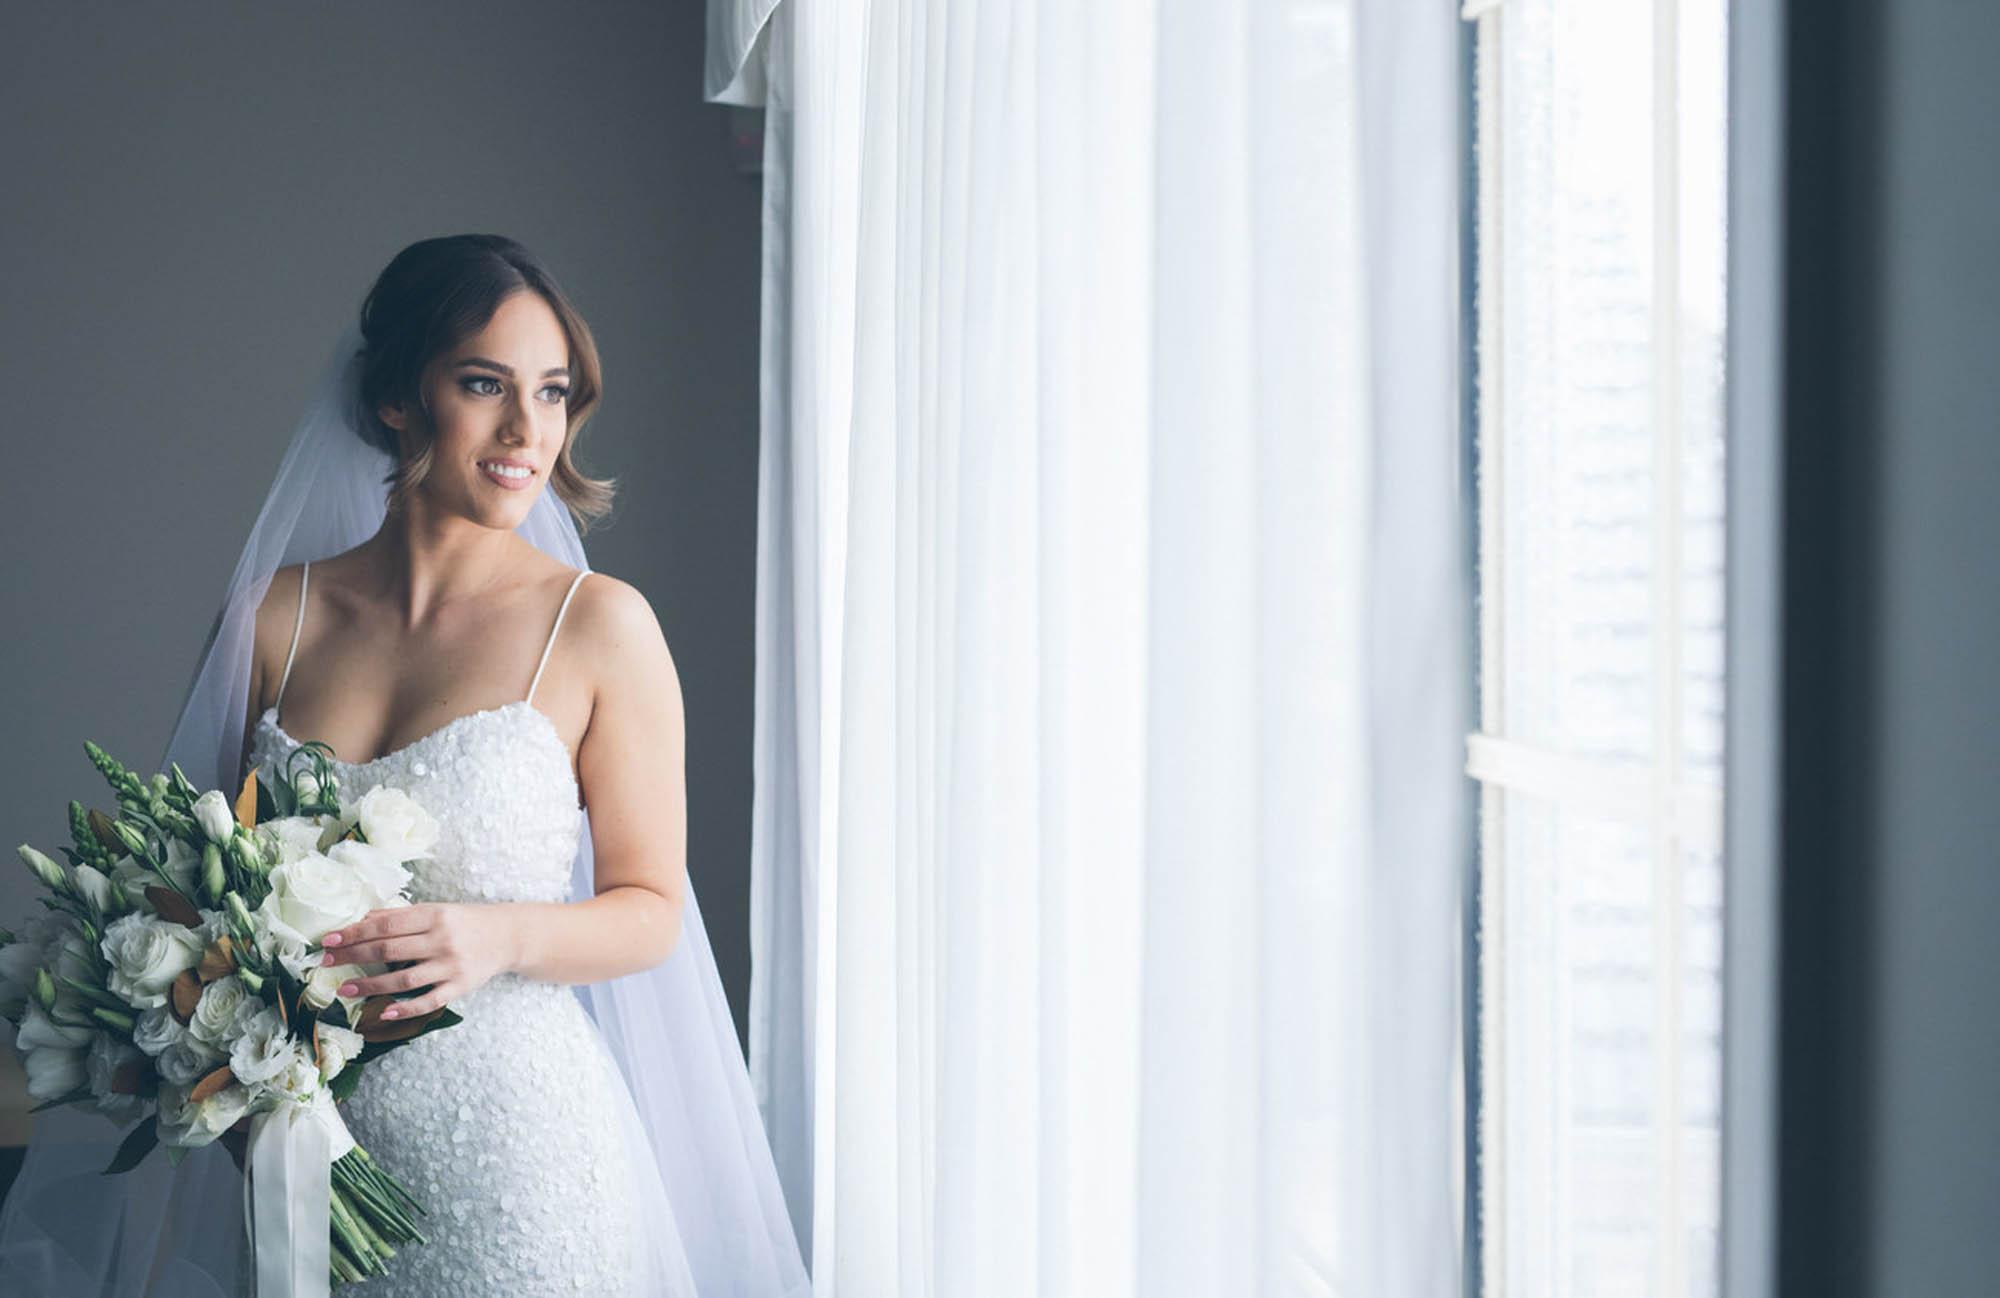 MacDougall-Photography-Sydney-Wedding-Photographers-1.jpg